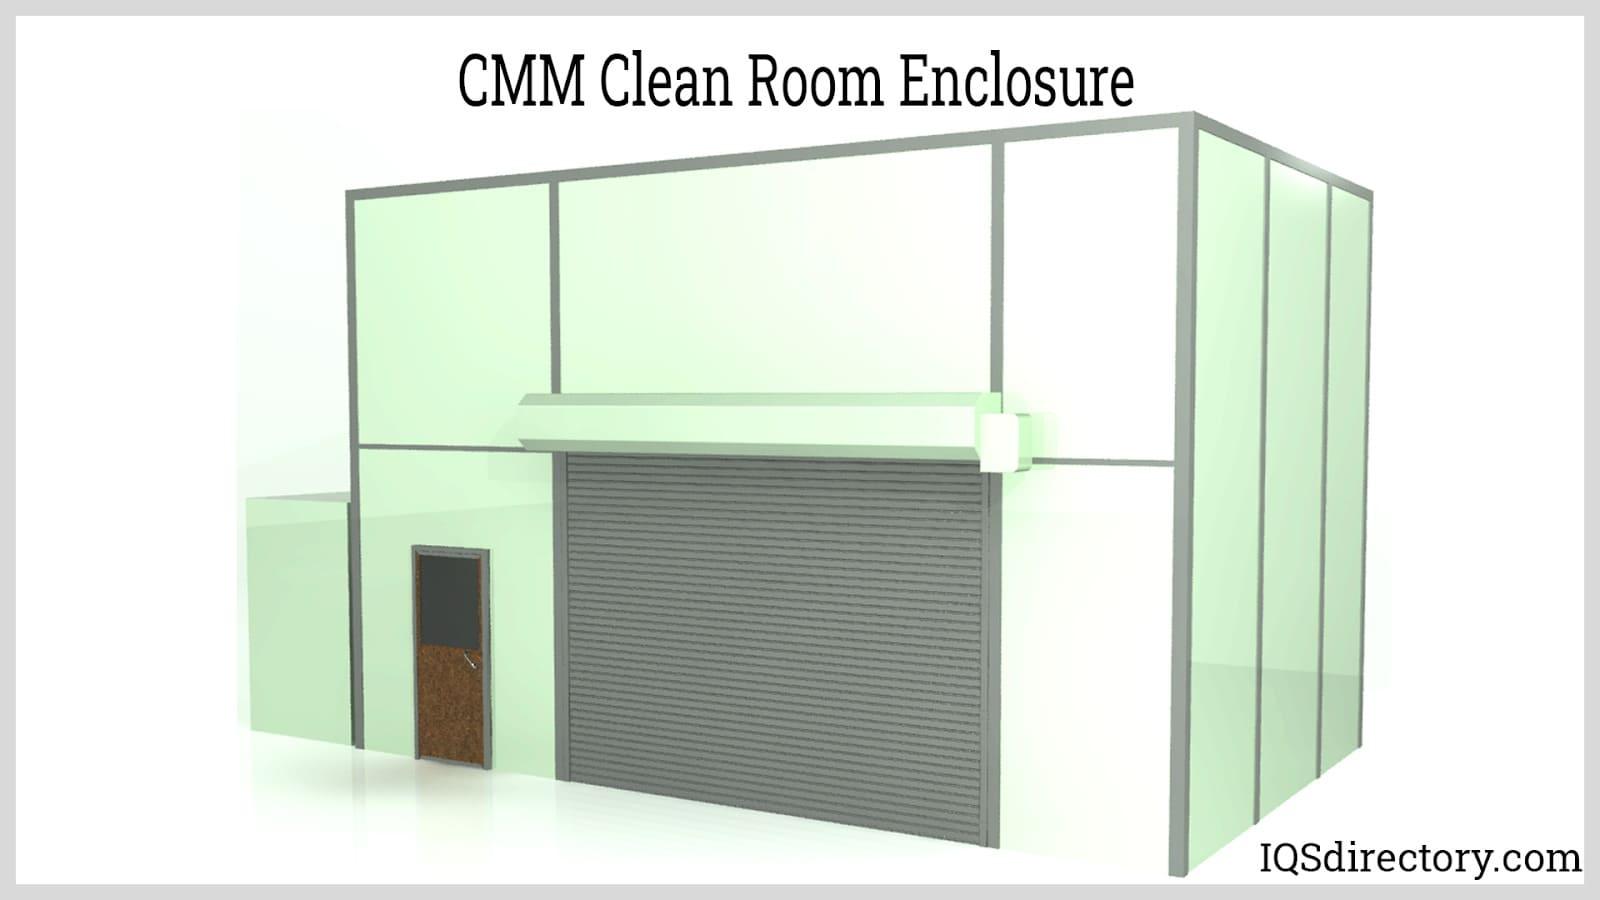 CMM Clean Room Enclosure